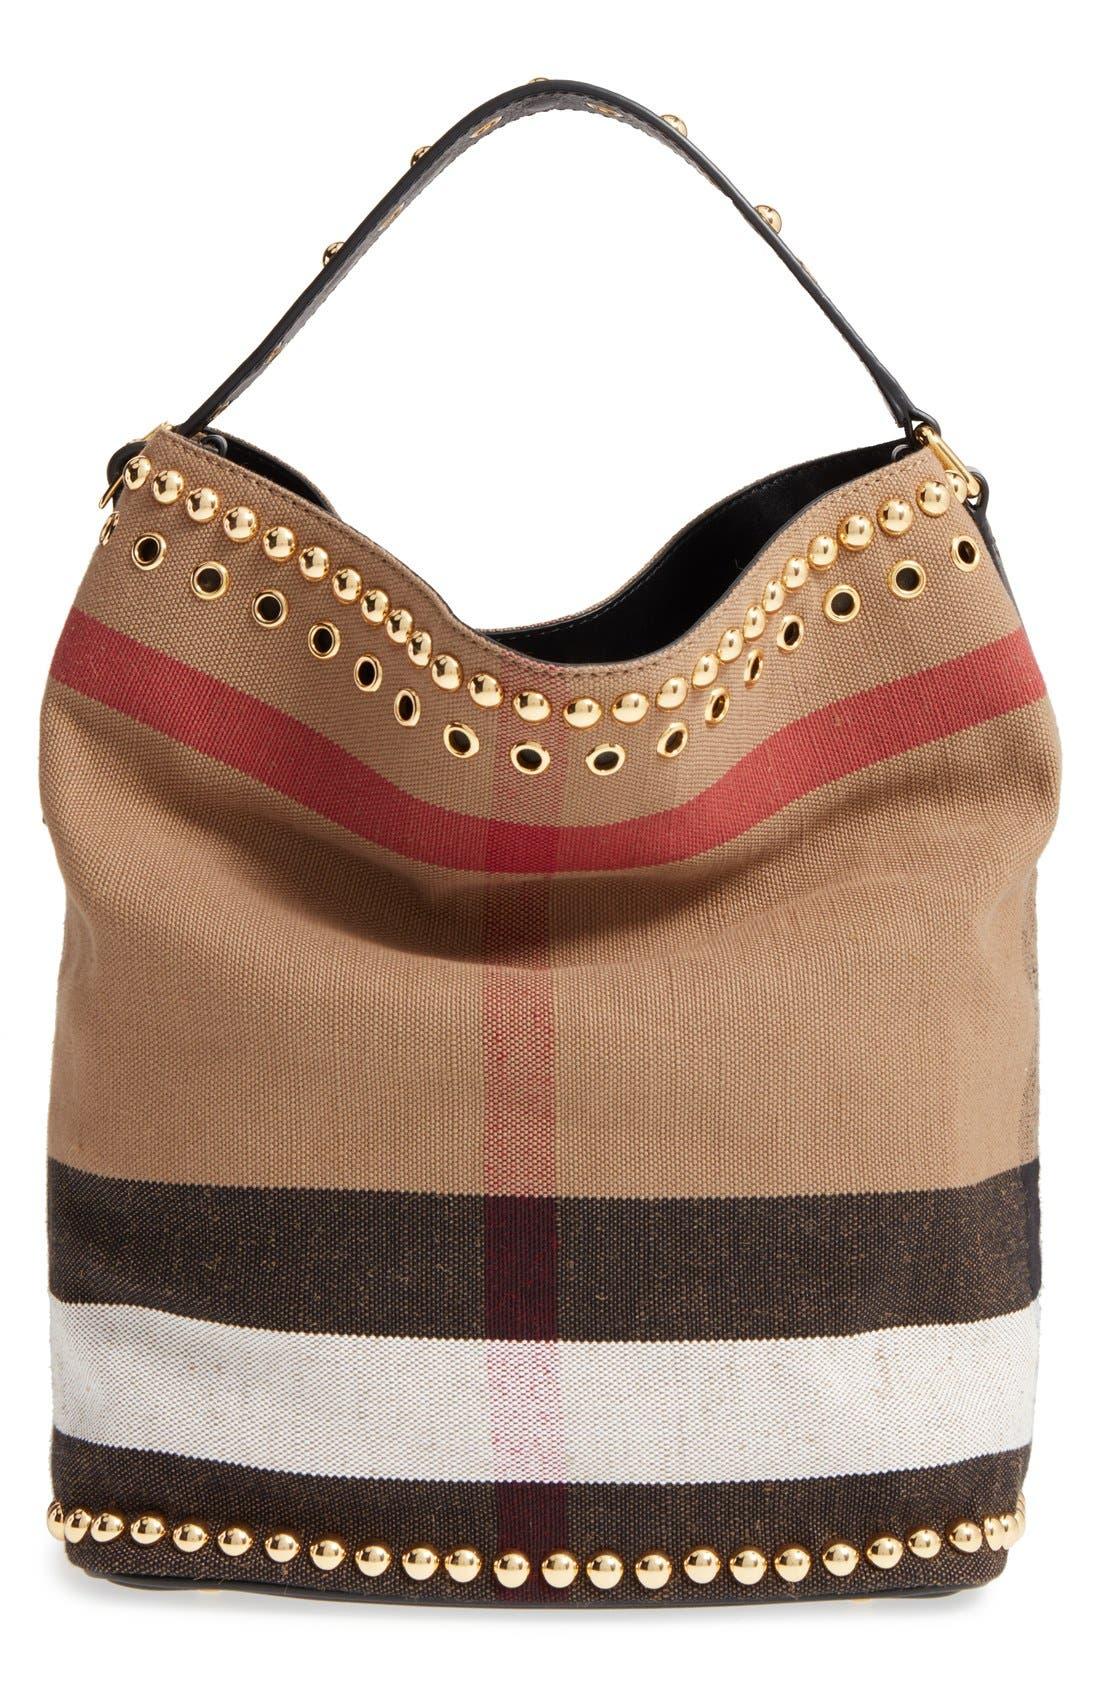 Alternate Image 1 Selected - Burberry Medium Ashby Studded Canvas Bucket Bag